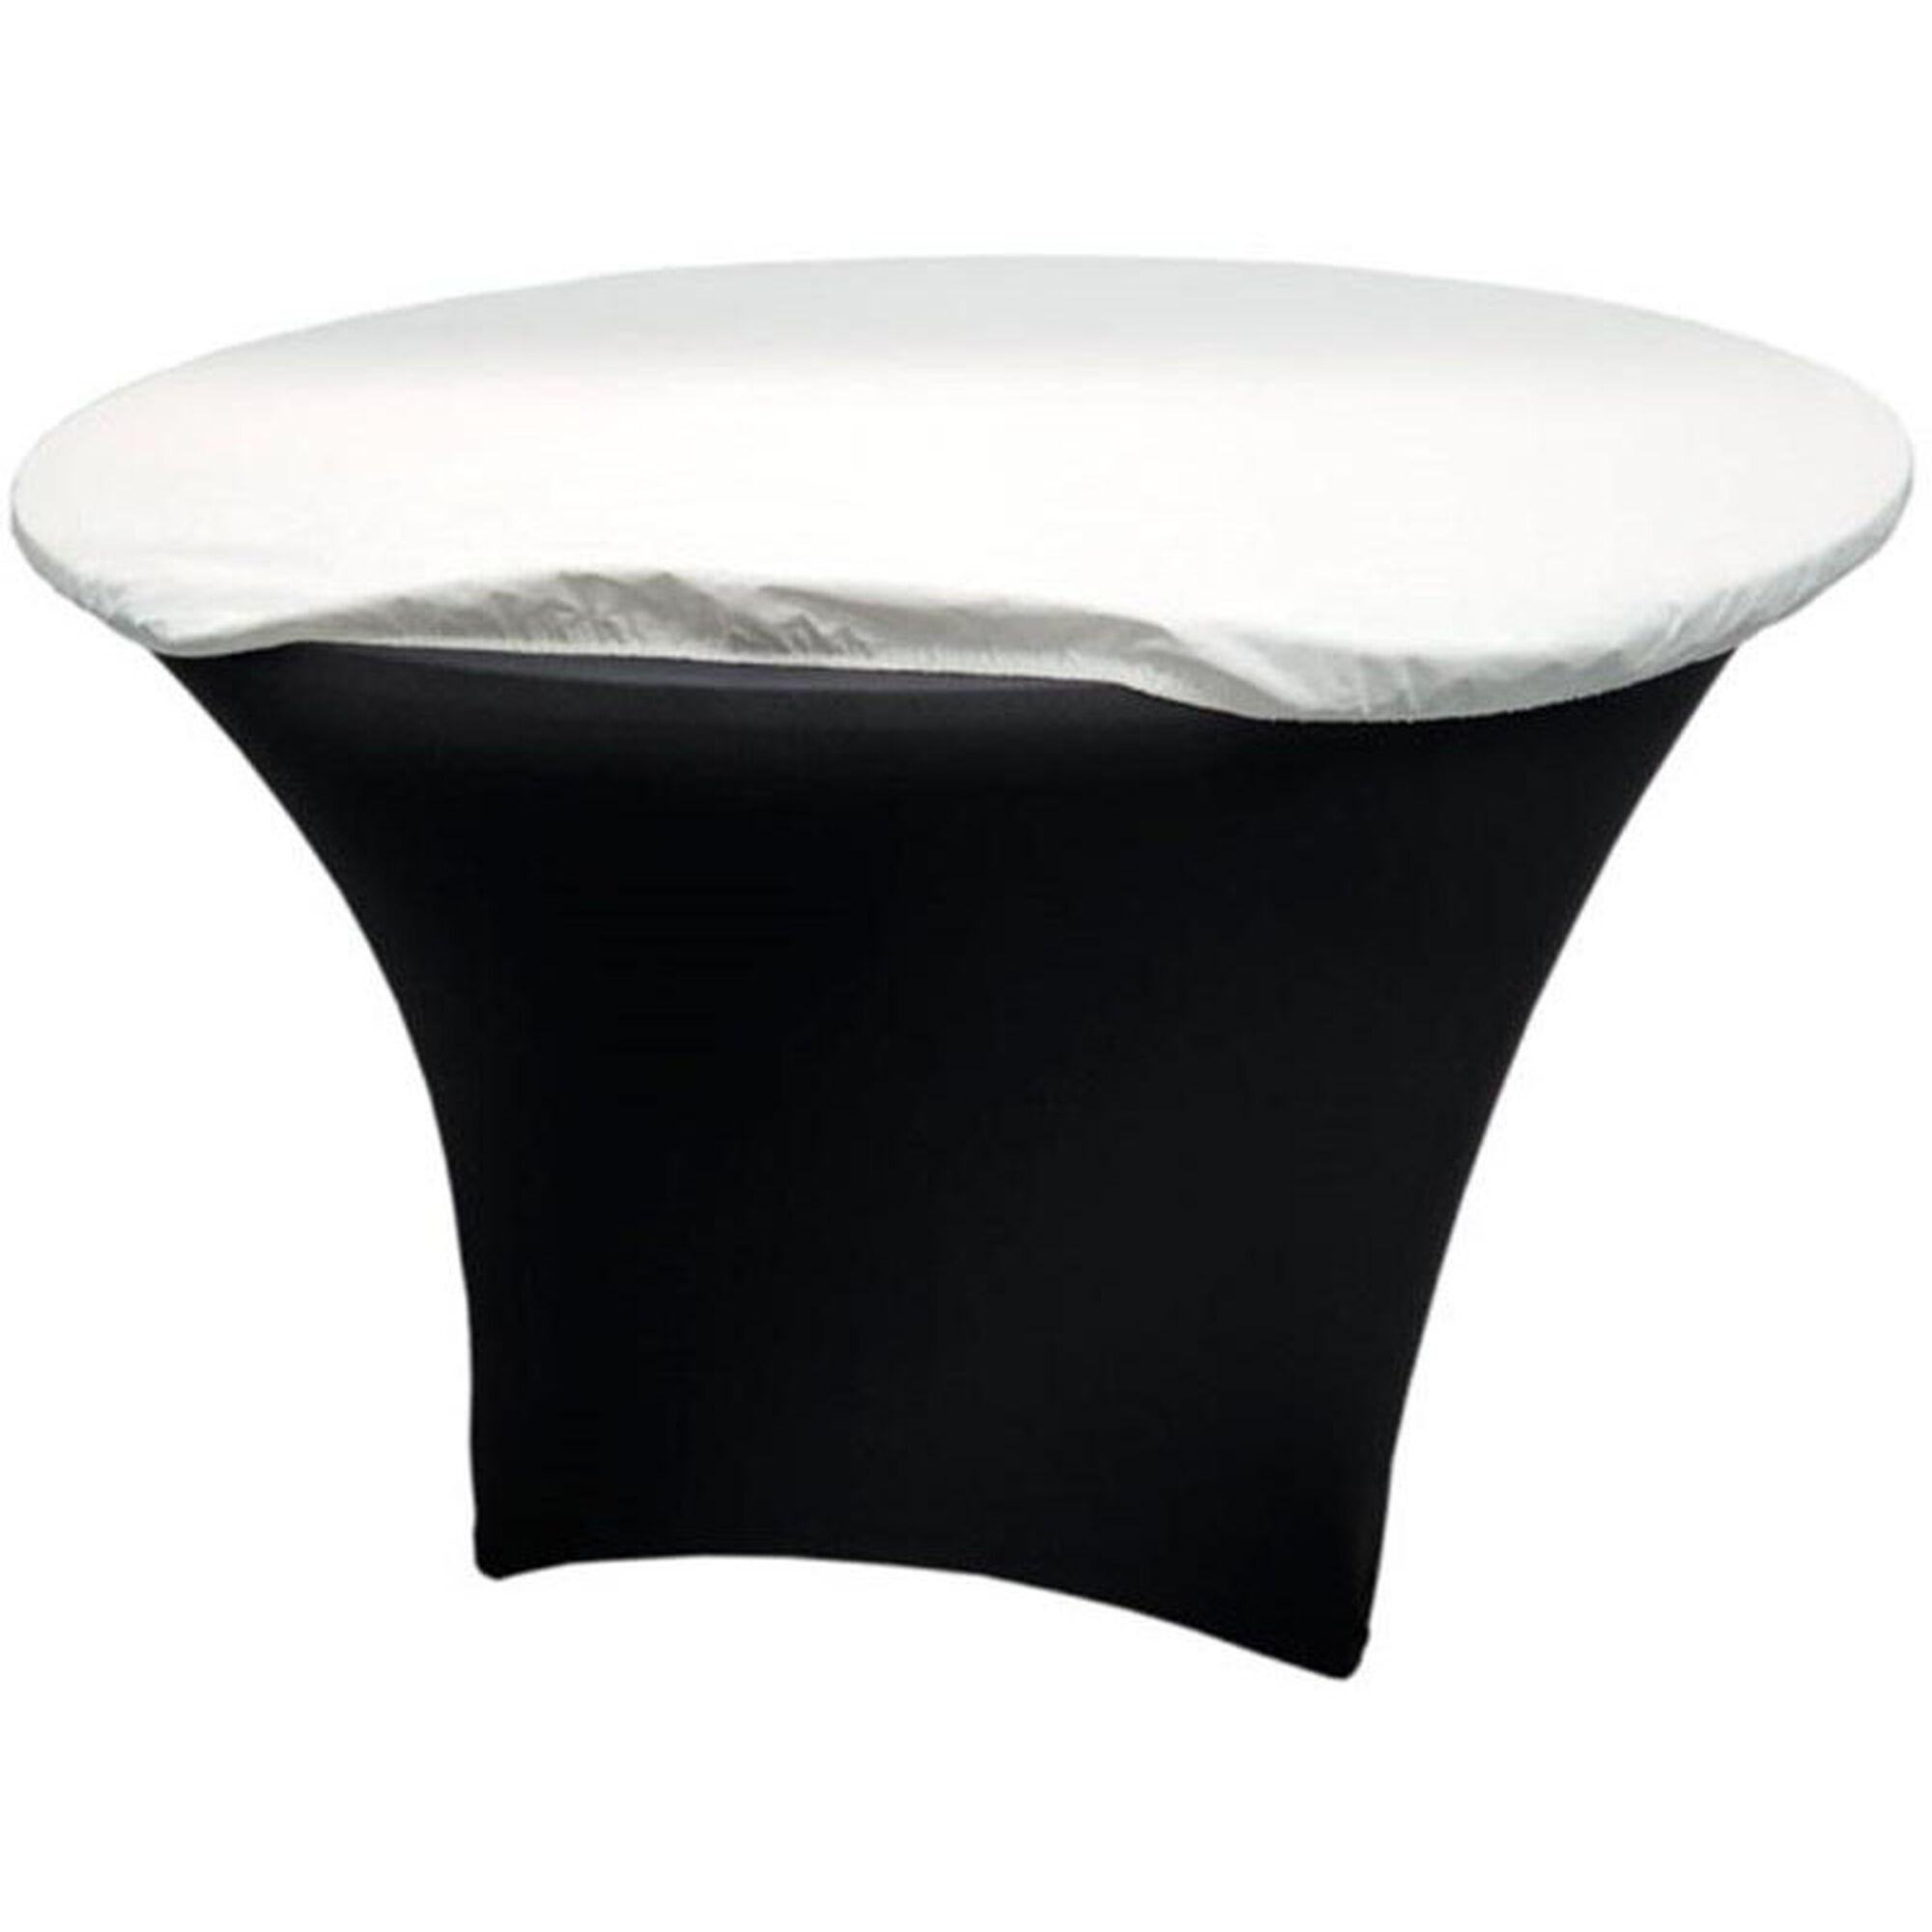 Snap drape 66 39 39 round vinyl felt back table padding for Html table padding